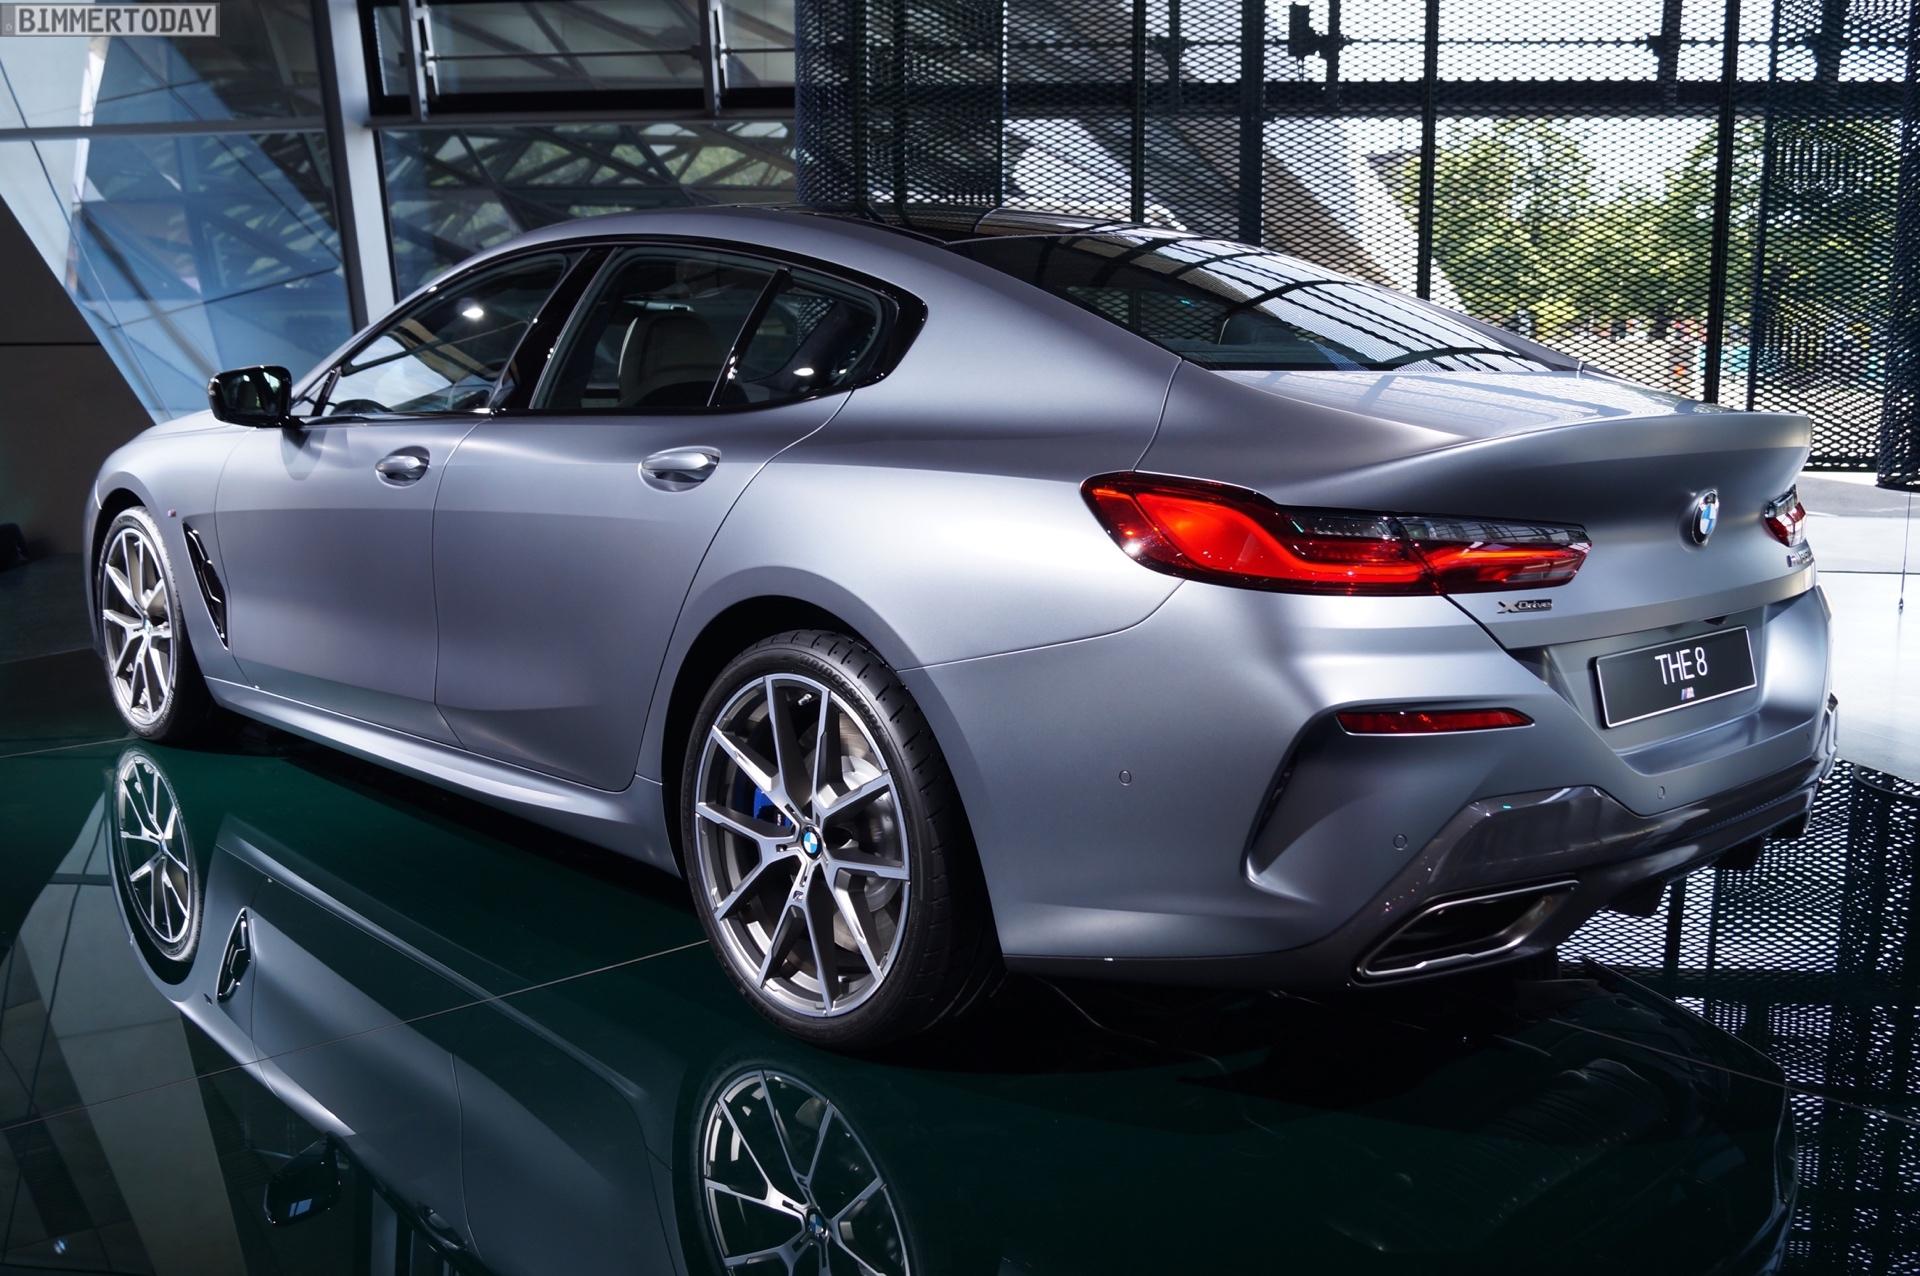 BMW M6 Gran Coupe >> #NextGen 2019: Live-Fotos zum BMW 8er Gran Coupé als M850i